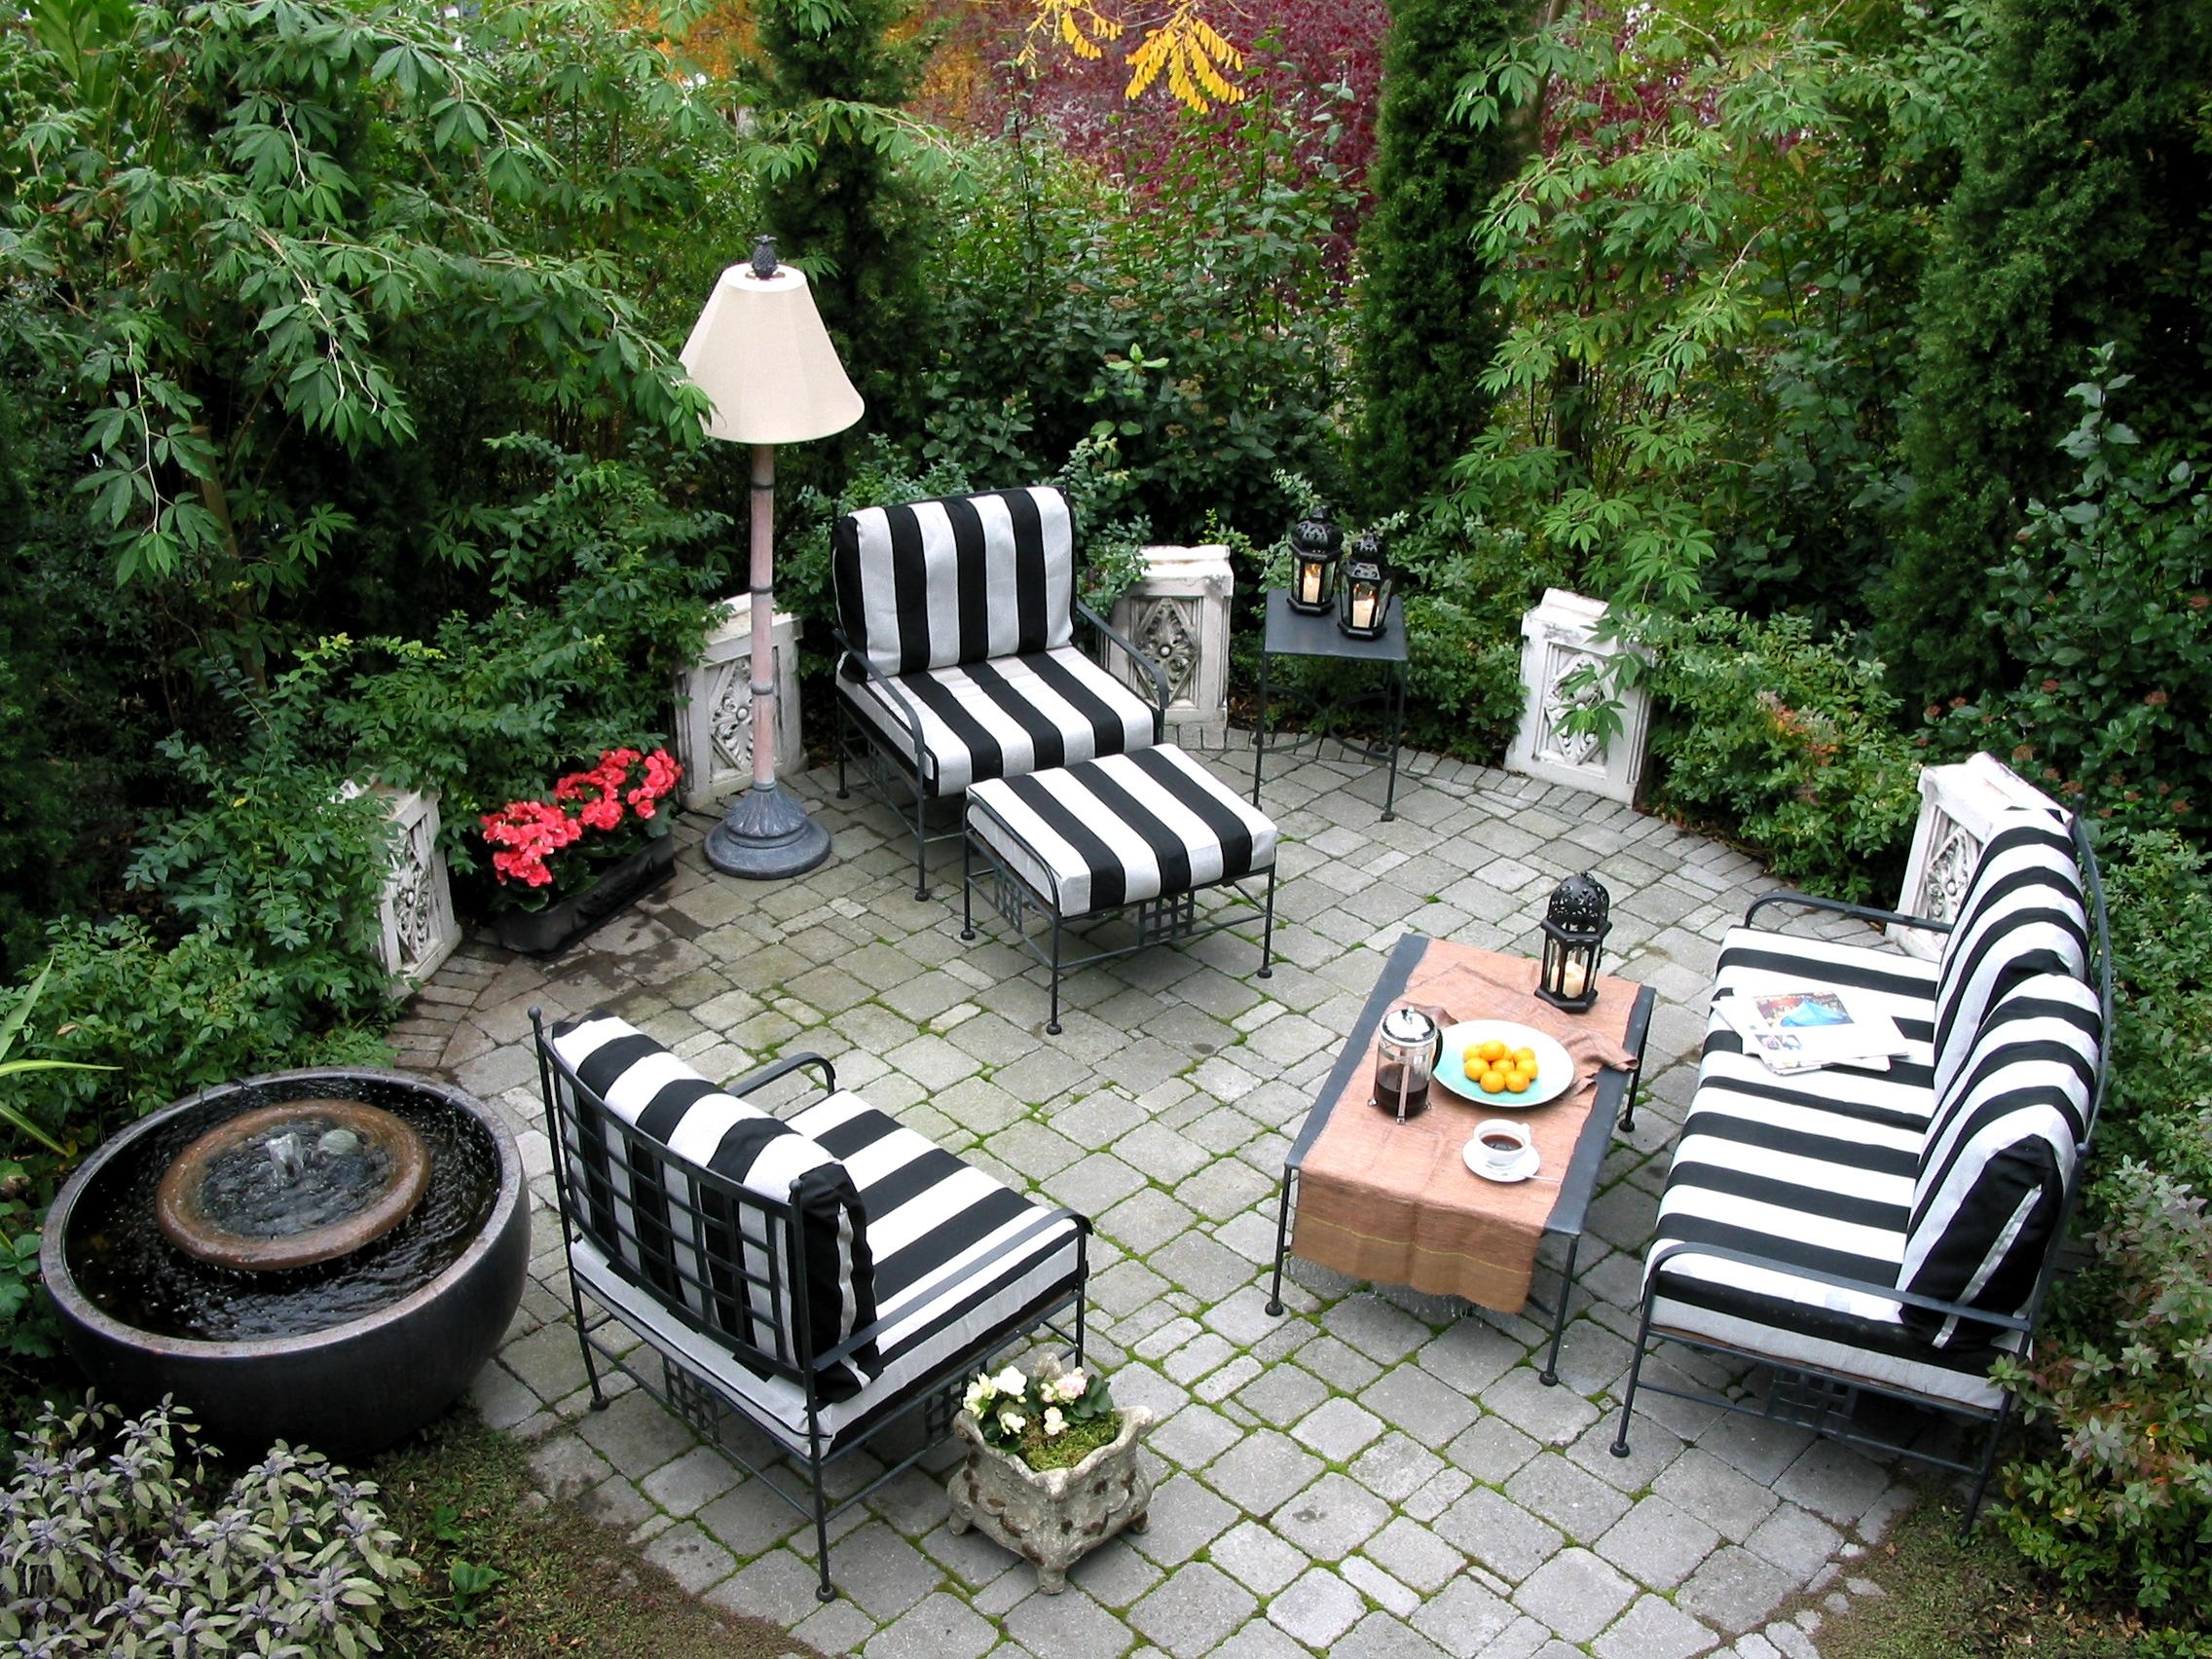 Daniel Lowery / Queen Anne Gardens LLC